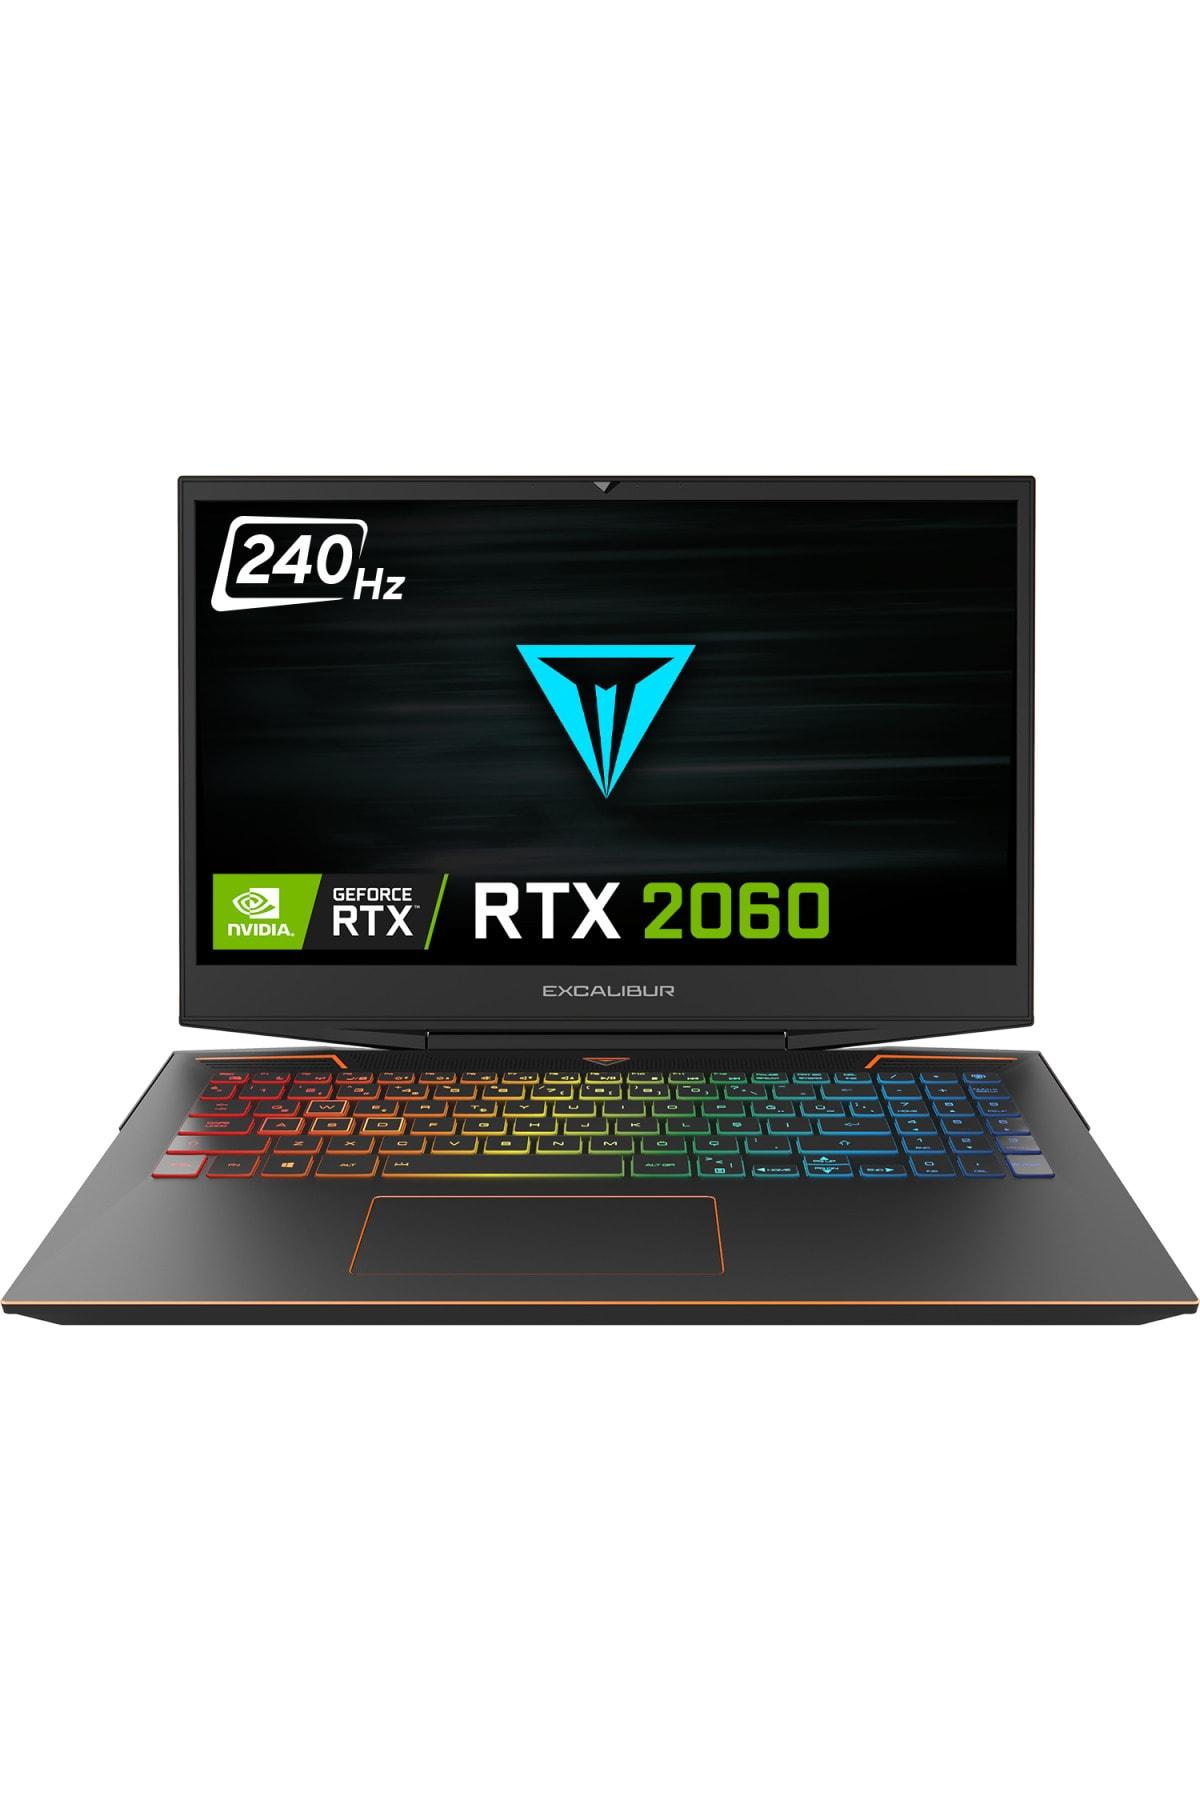 Excalibur G900.1075-bv60x-d Intel 10.nesil I7-10750h 16gb Ram 500gb Nvme Ssd 6gb Rtx2060 Dos